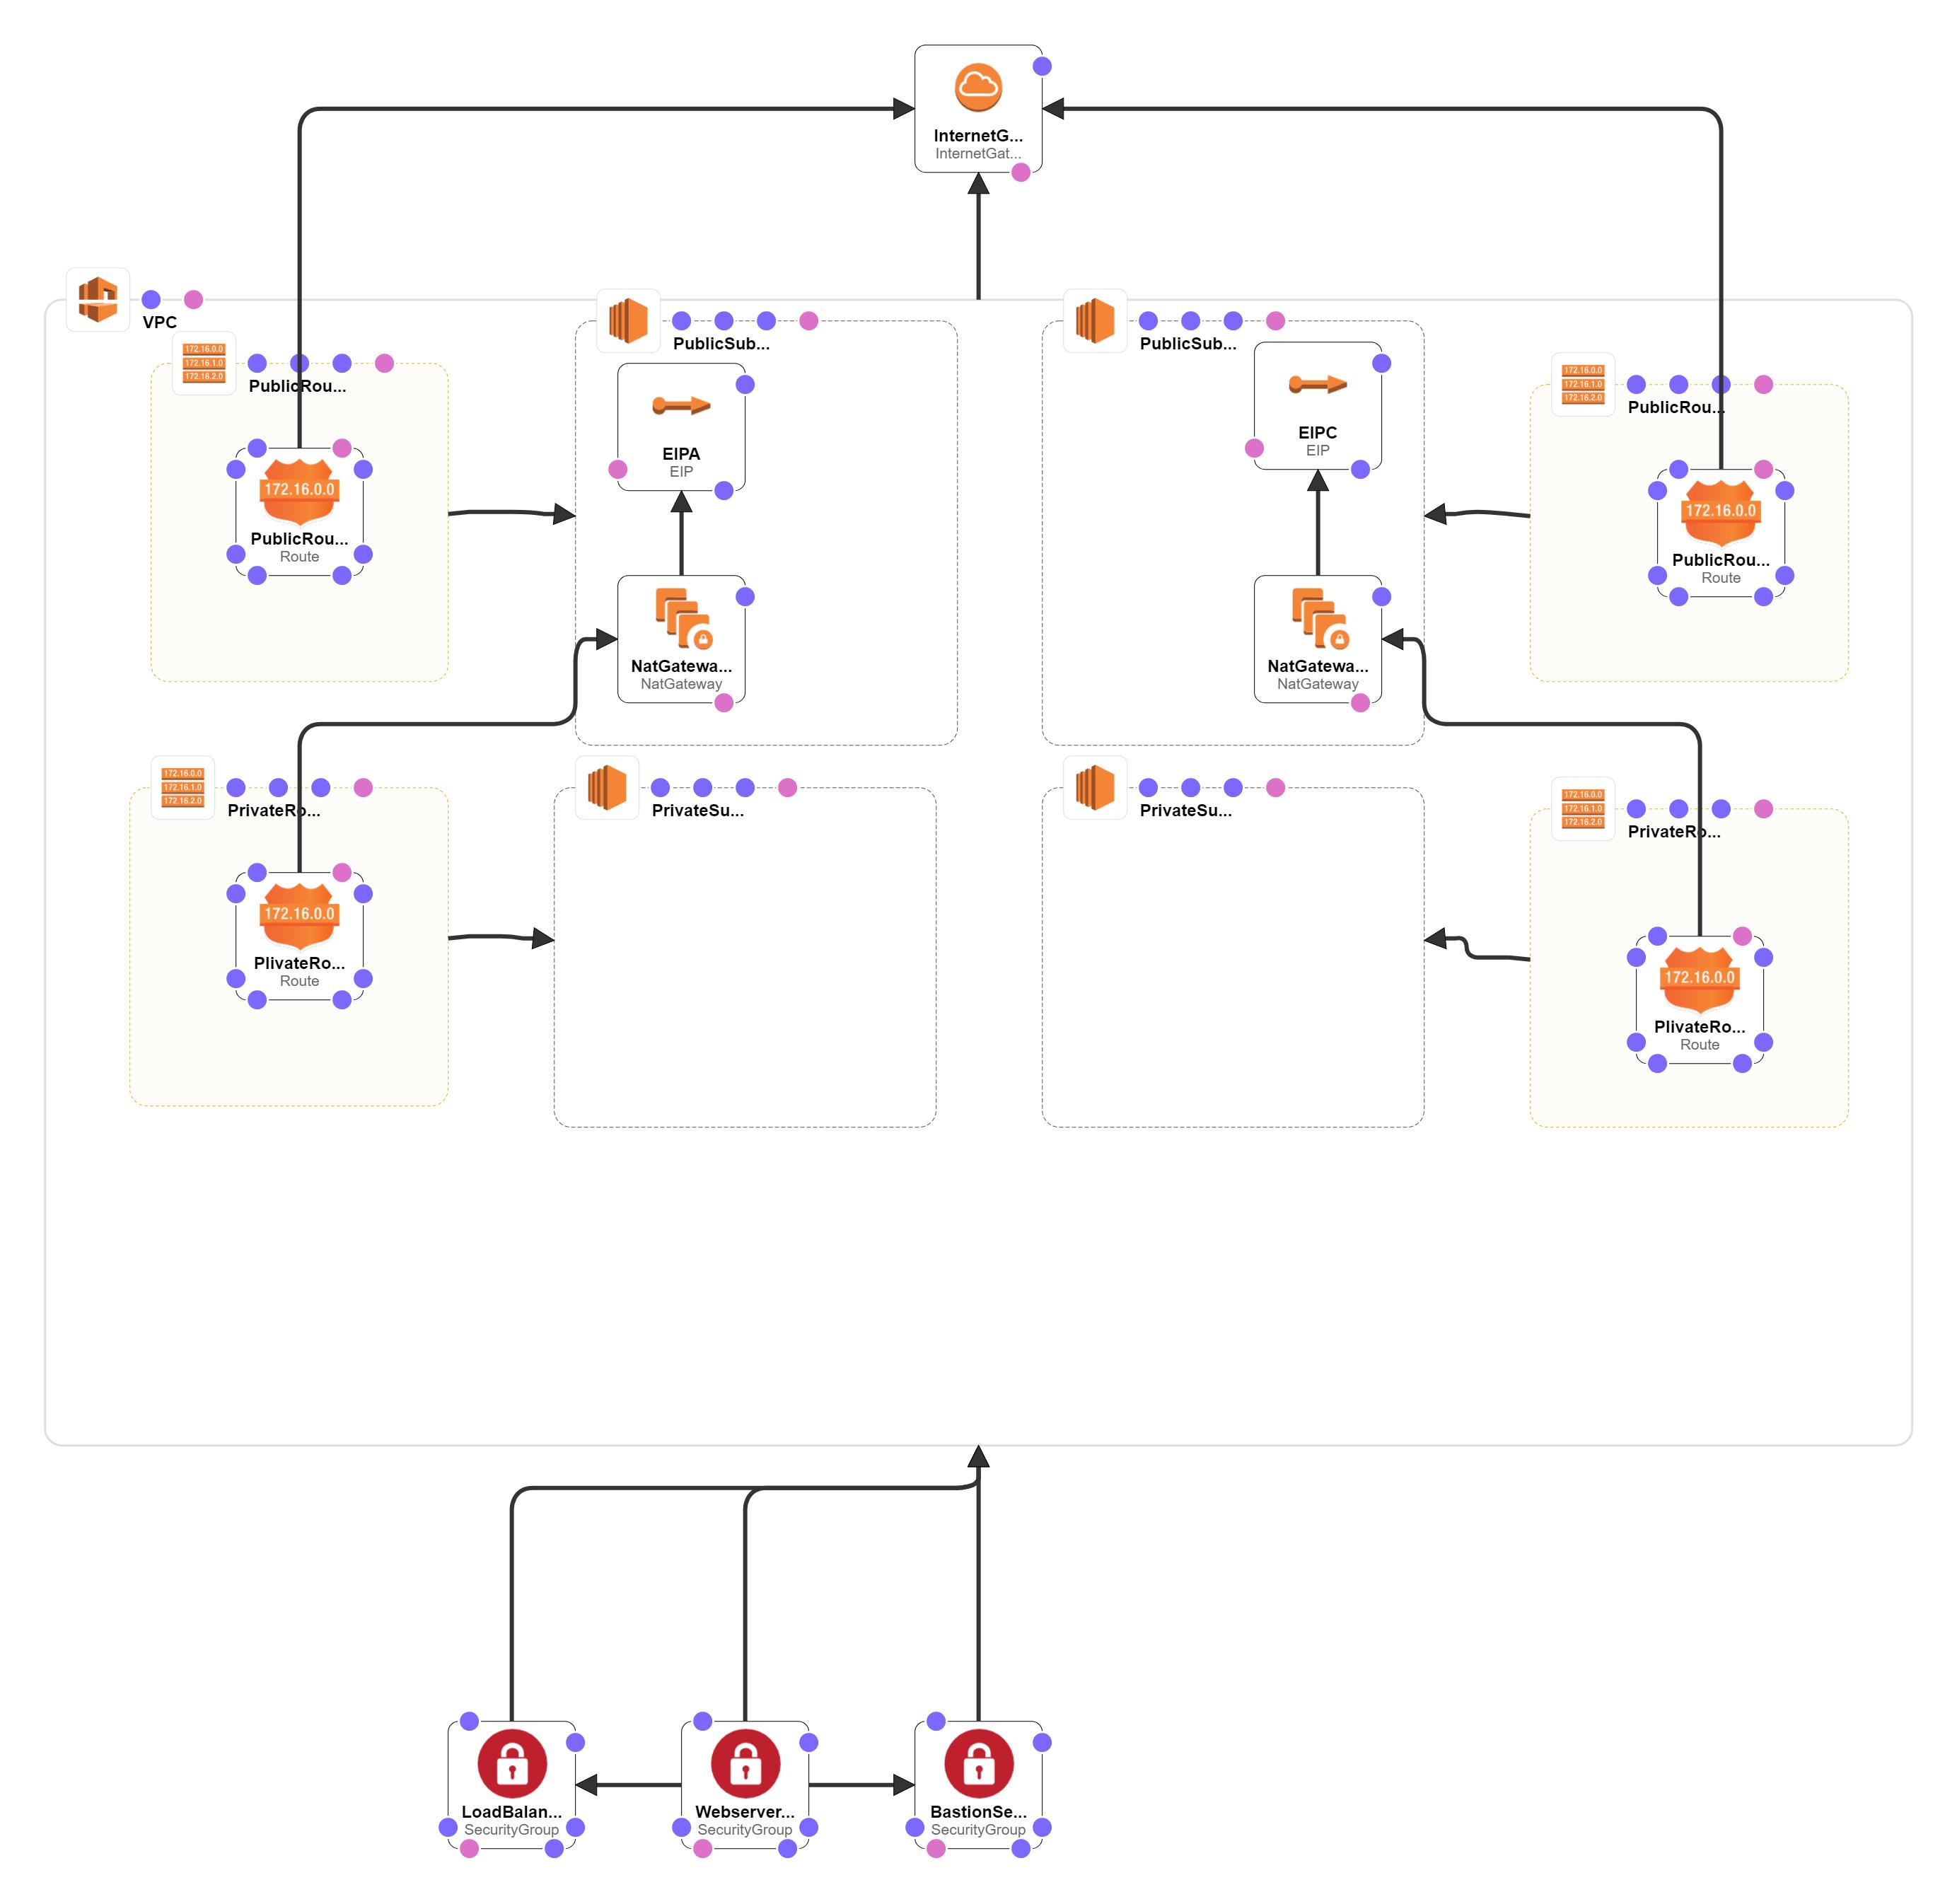 template1-designer.png